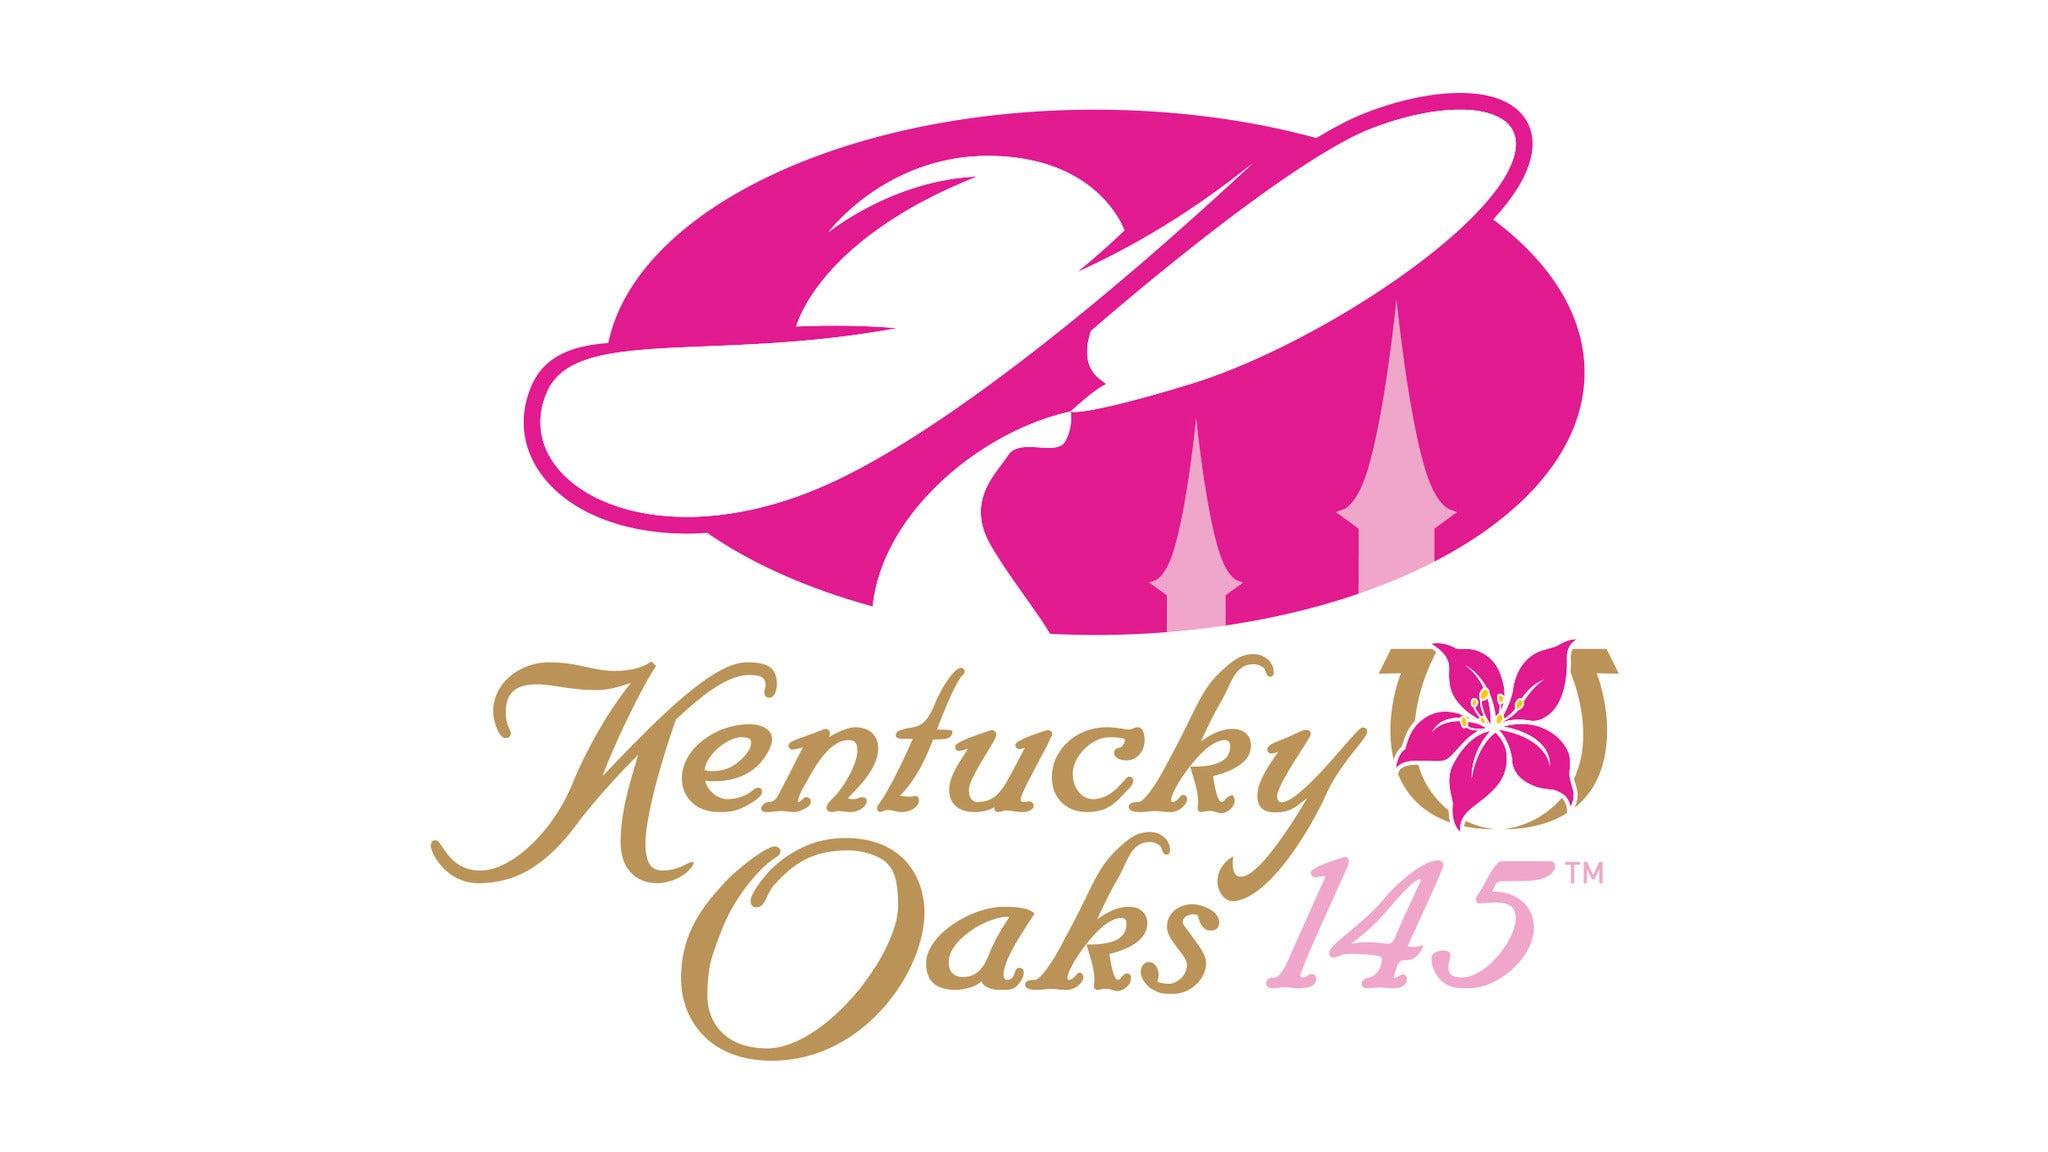 145th Kentucky Oaks  - Clubhouse Walk - No Seat